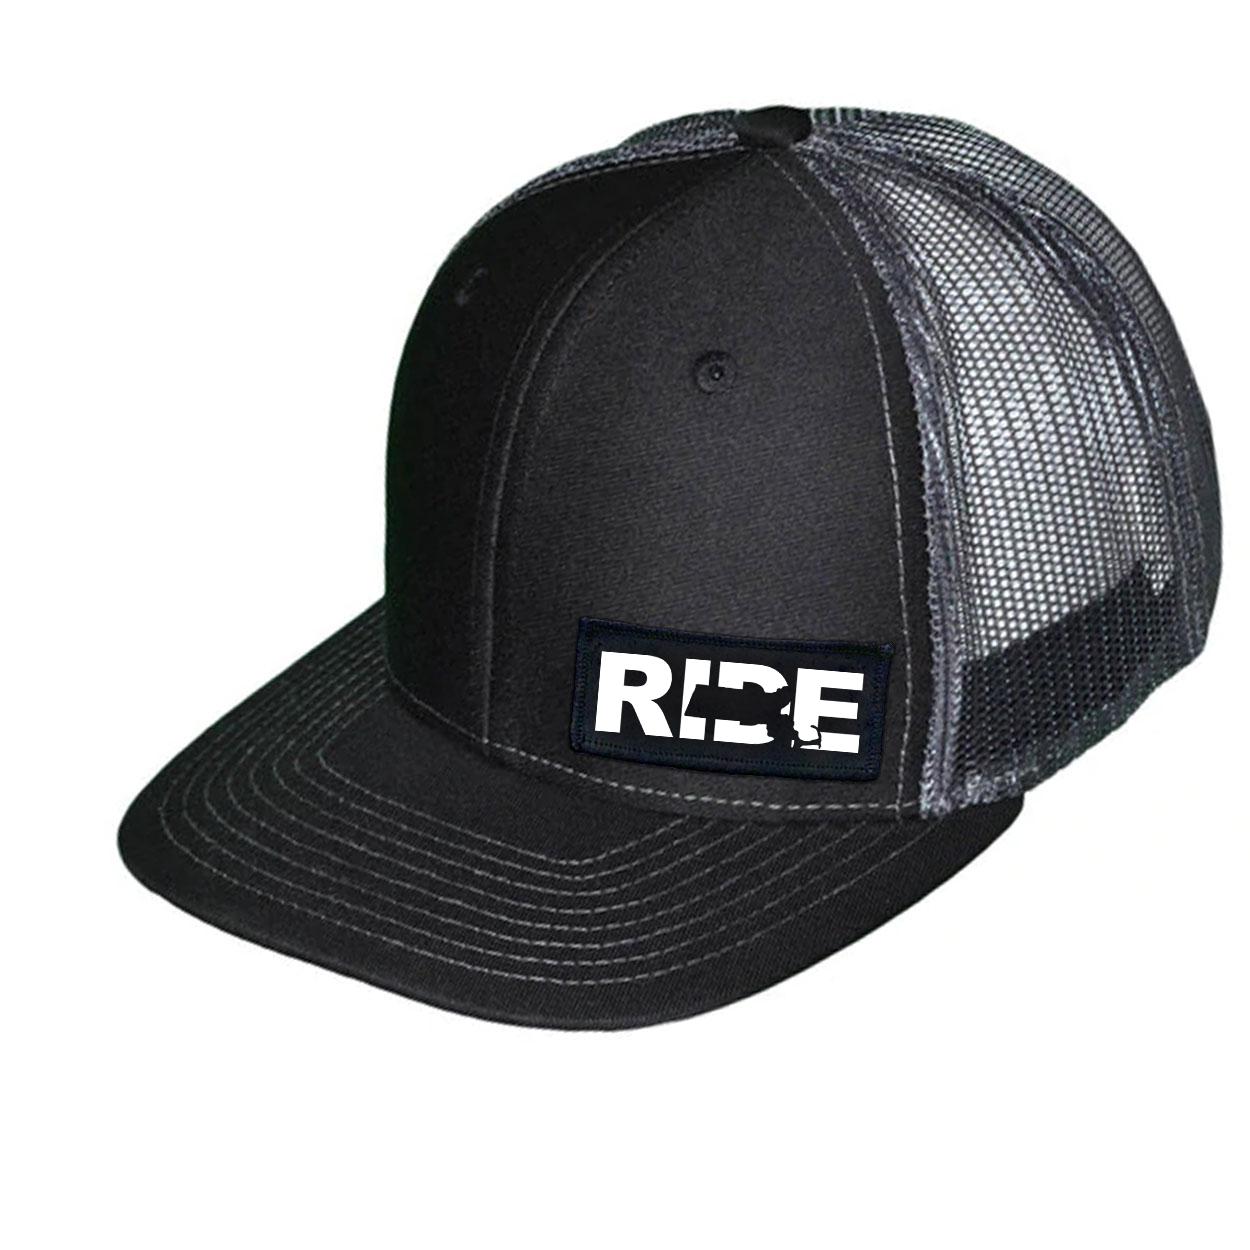 Ride Massachusetts Night Out Woven Patch Snapback Trucker Hat Black/Dark Gray (White Logo)